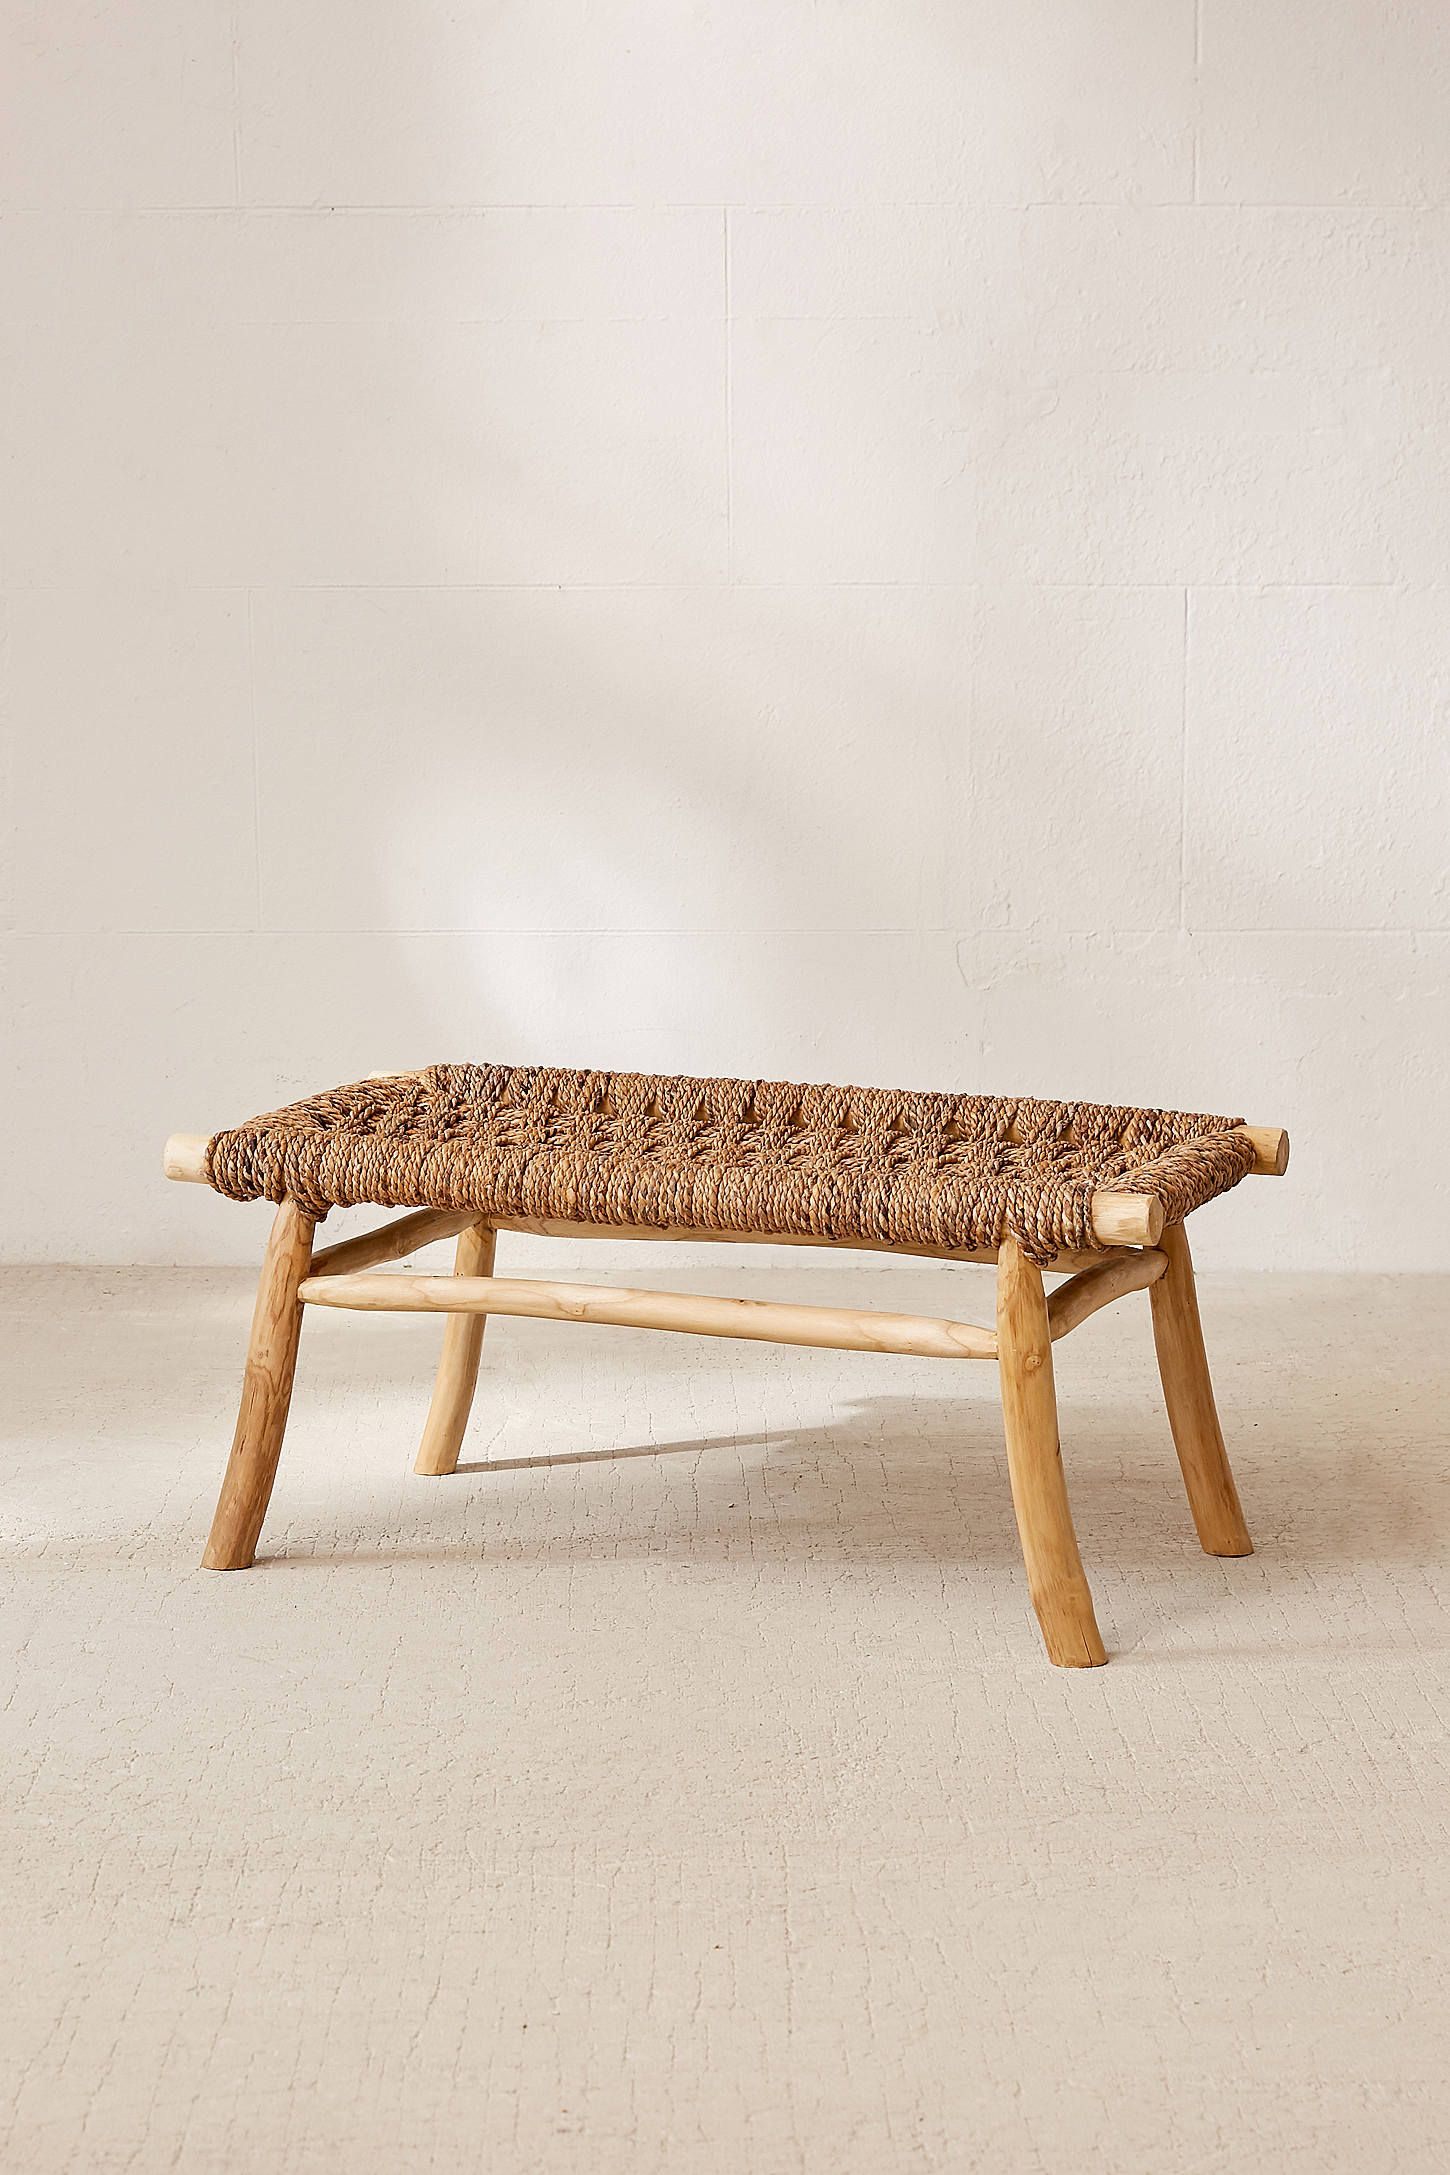 Elle Woven Bench Woven Bench Furniture Decor